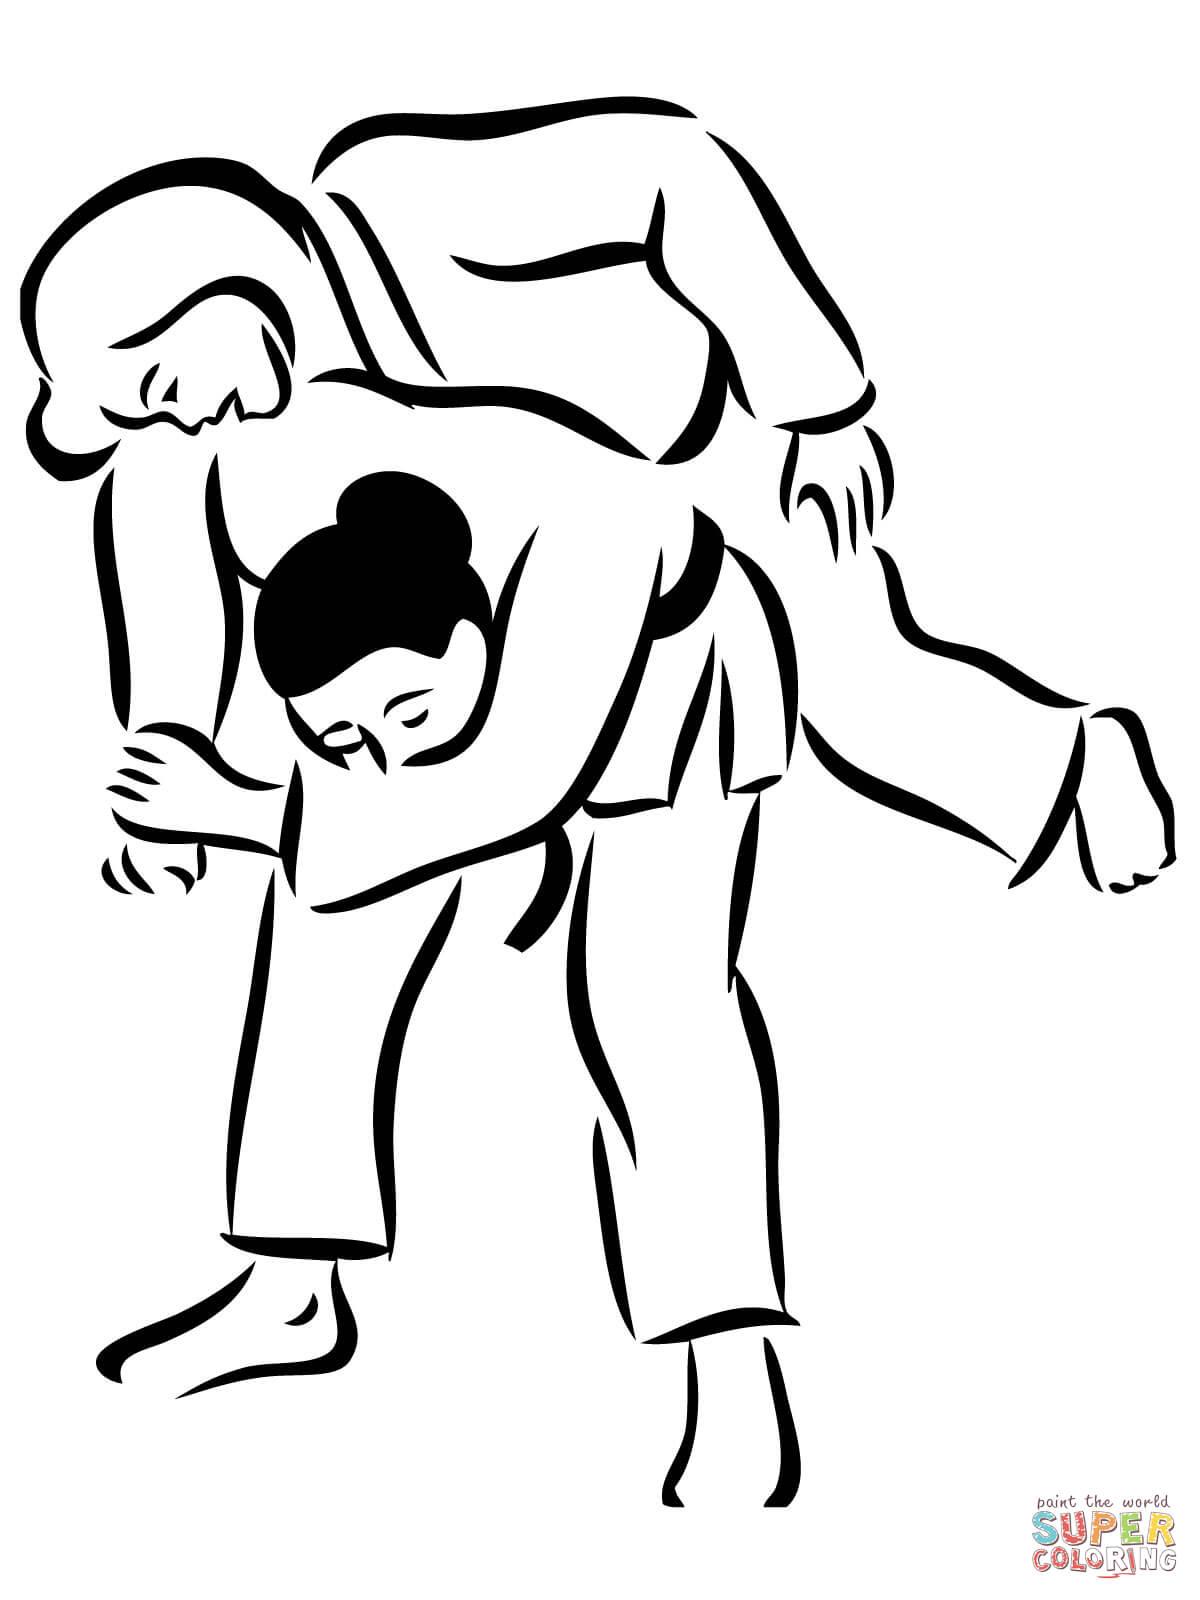 Seoi Nage Judo Throwing Coloring Page